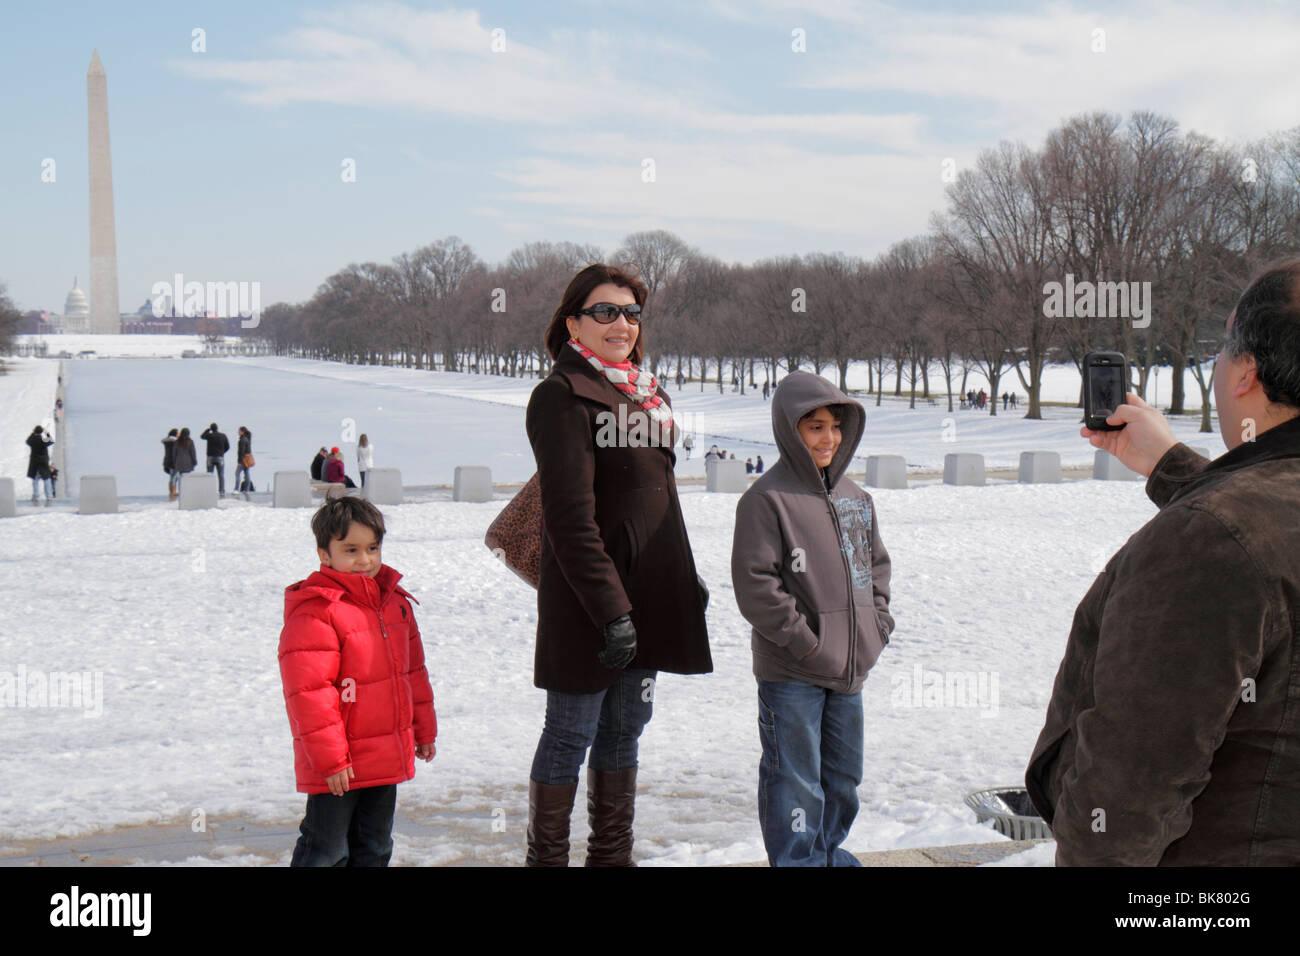 Washington DC West Potomac Park National Mall and Memorial Parks The Reflecting Pool Washington Monument history - Stock Image